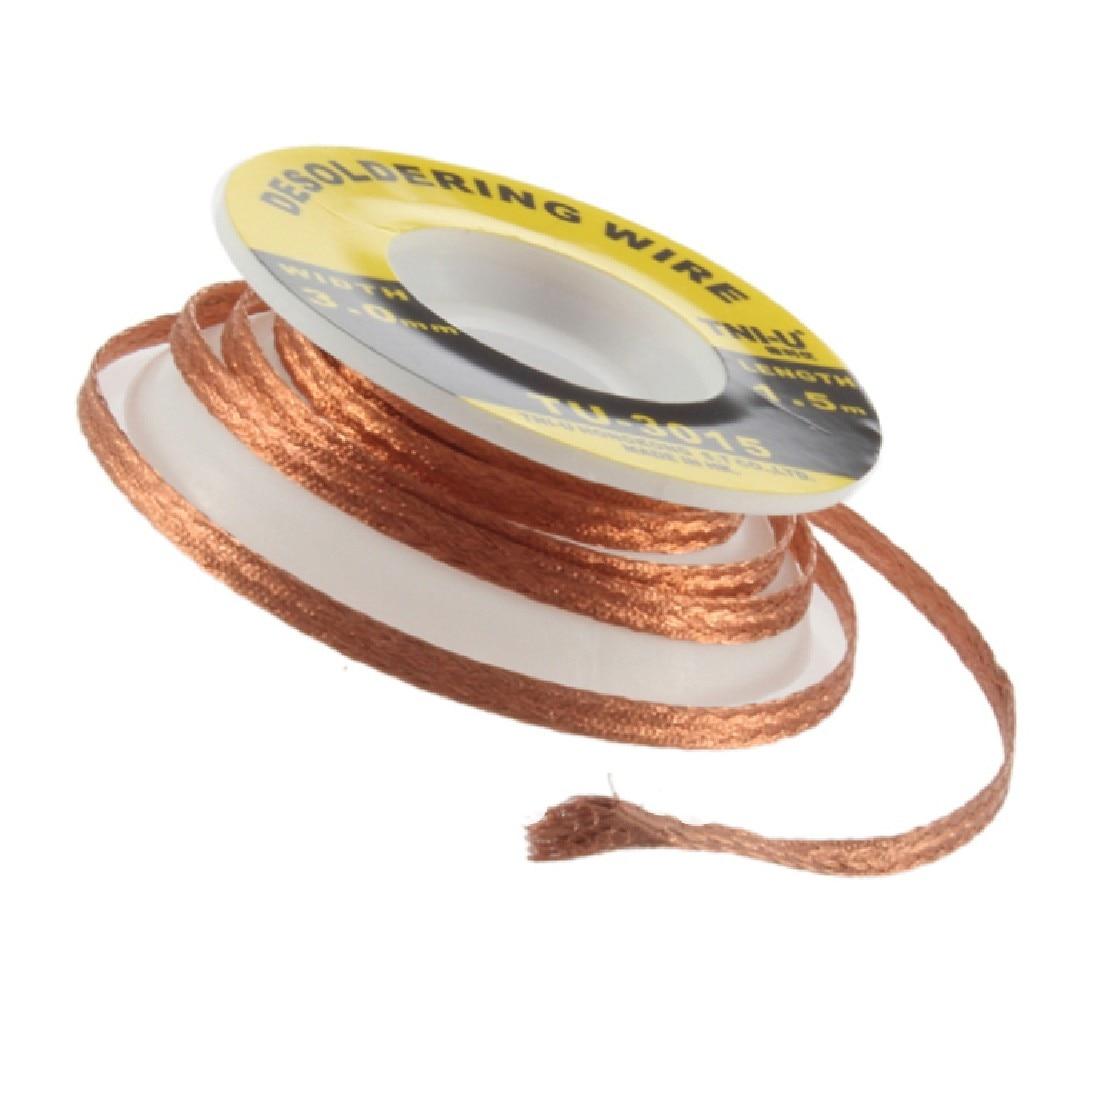 1.5M 3.0mm BGA Desoldering Wire Braid Solder Remover Wick Soldering Accessory Metal Color Tin